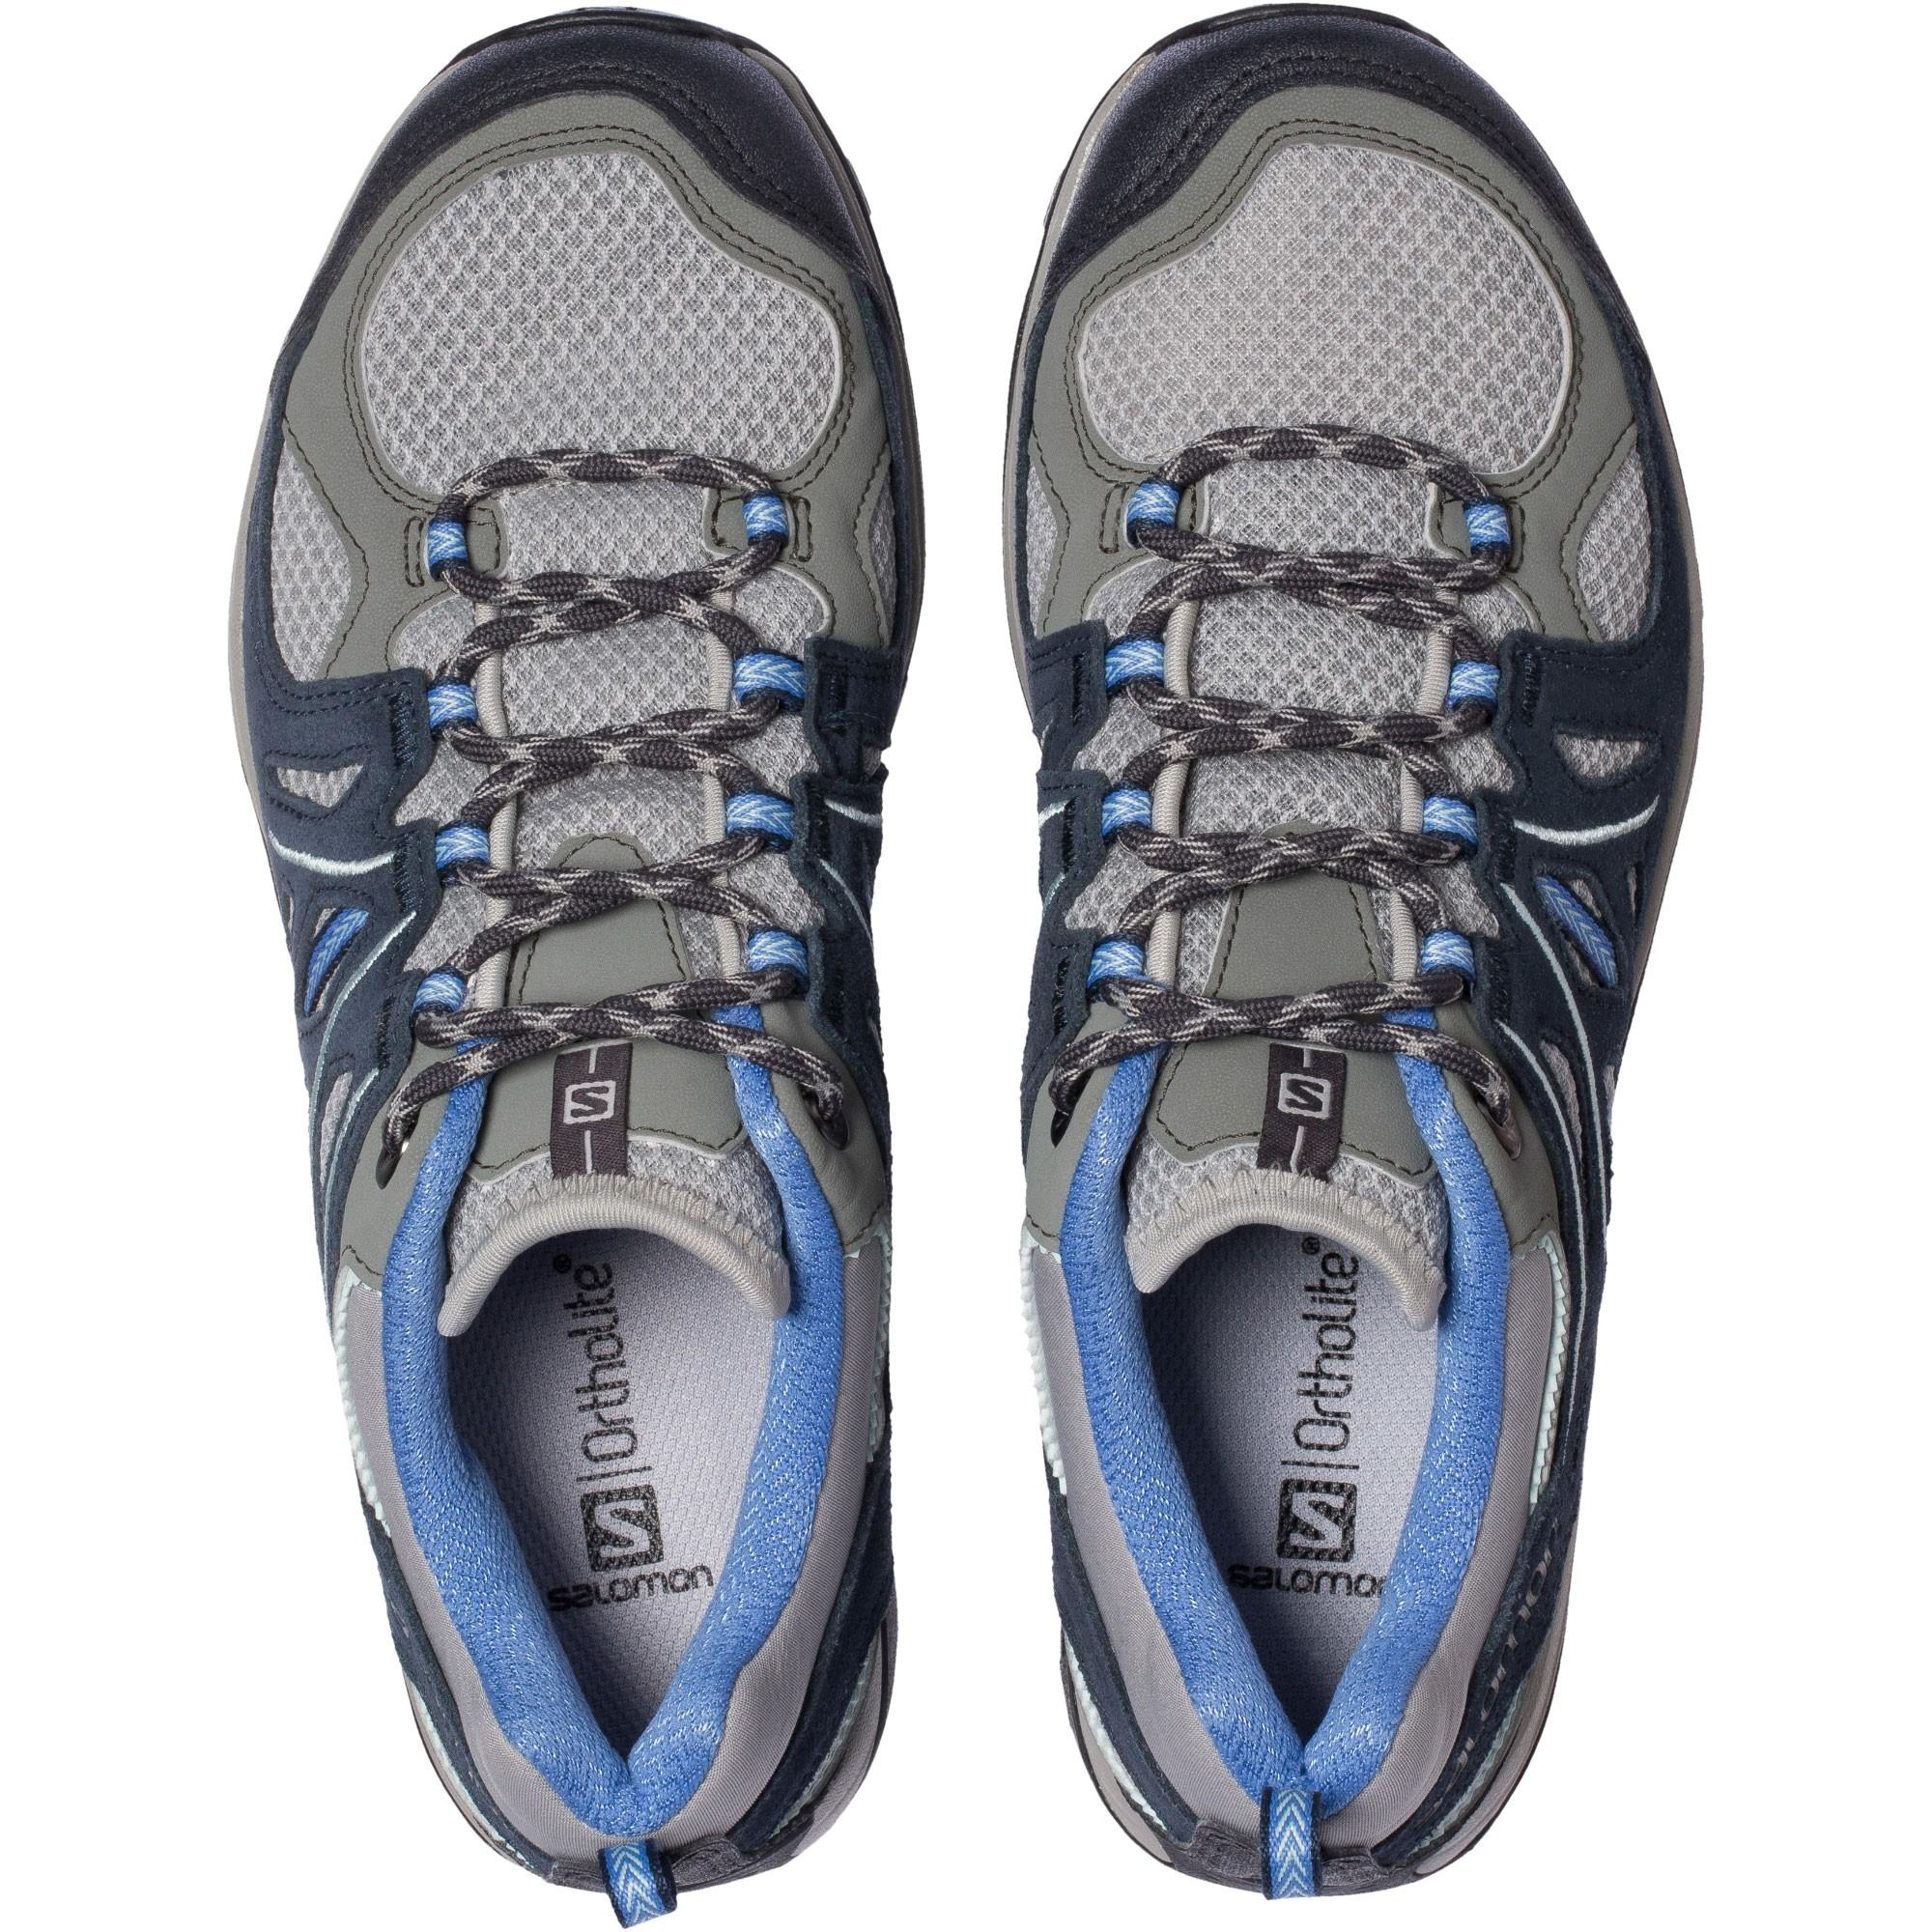 Salomon Women's Ellipse 2 Aero Approach Shoe - Titanium/Deep Blue/Petunia Blue